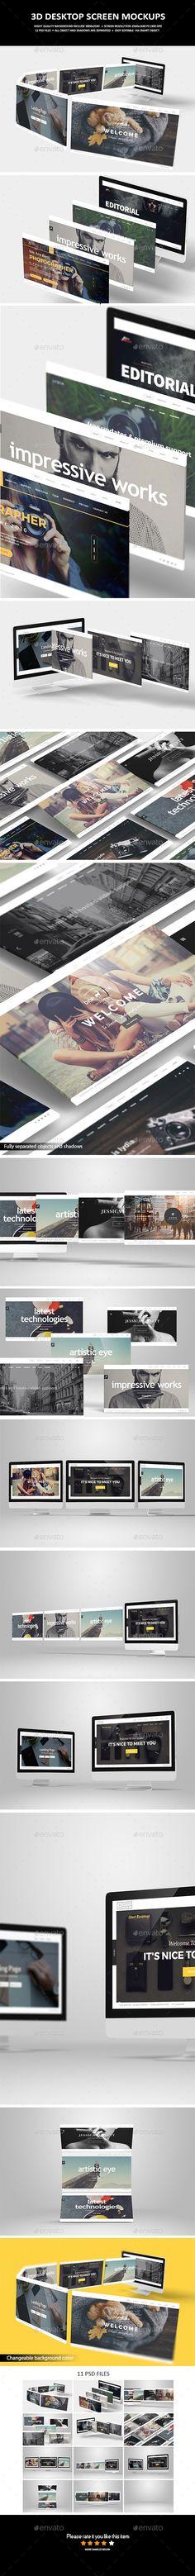 3D Desktop Screen Mock-Up